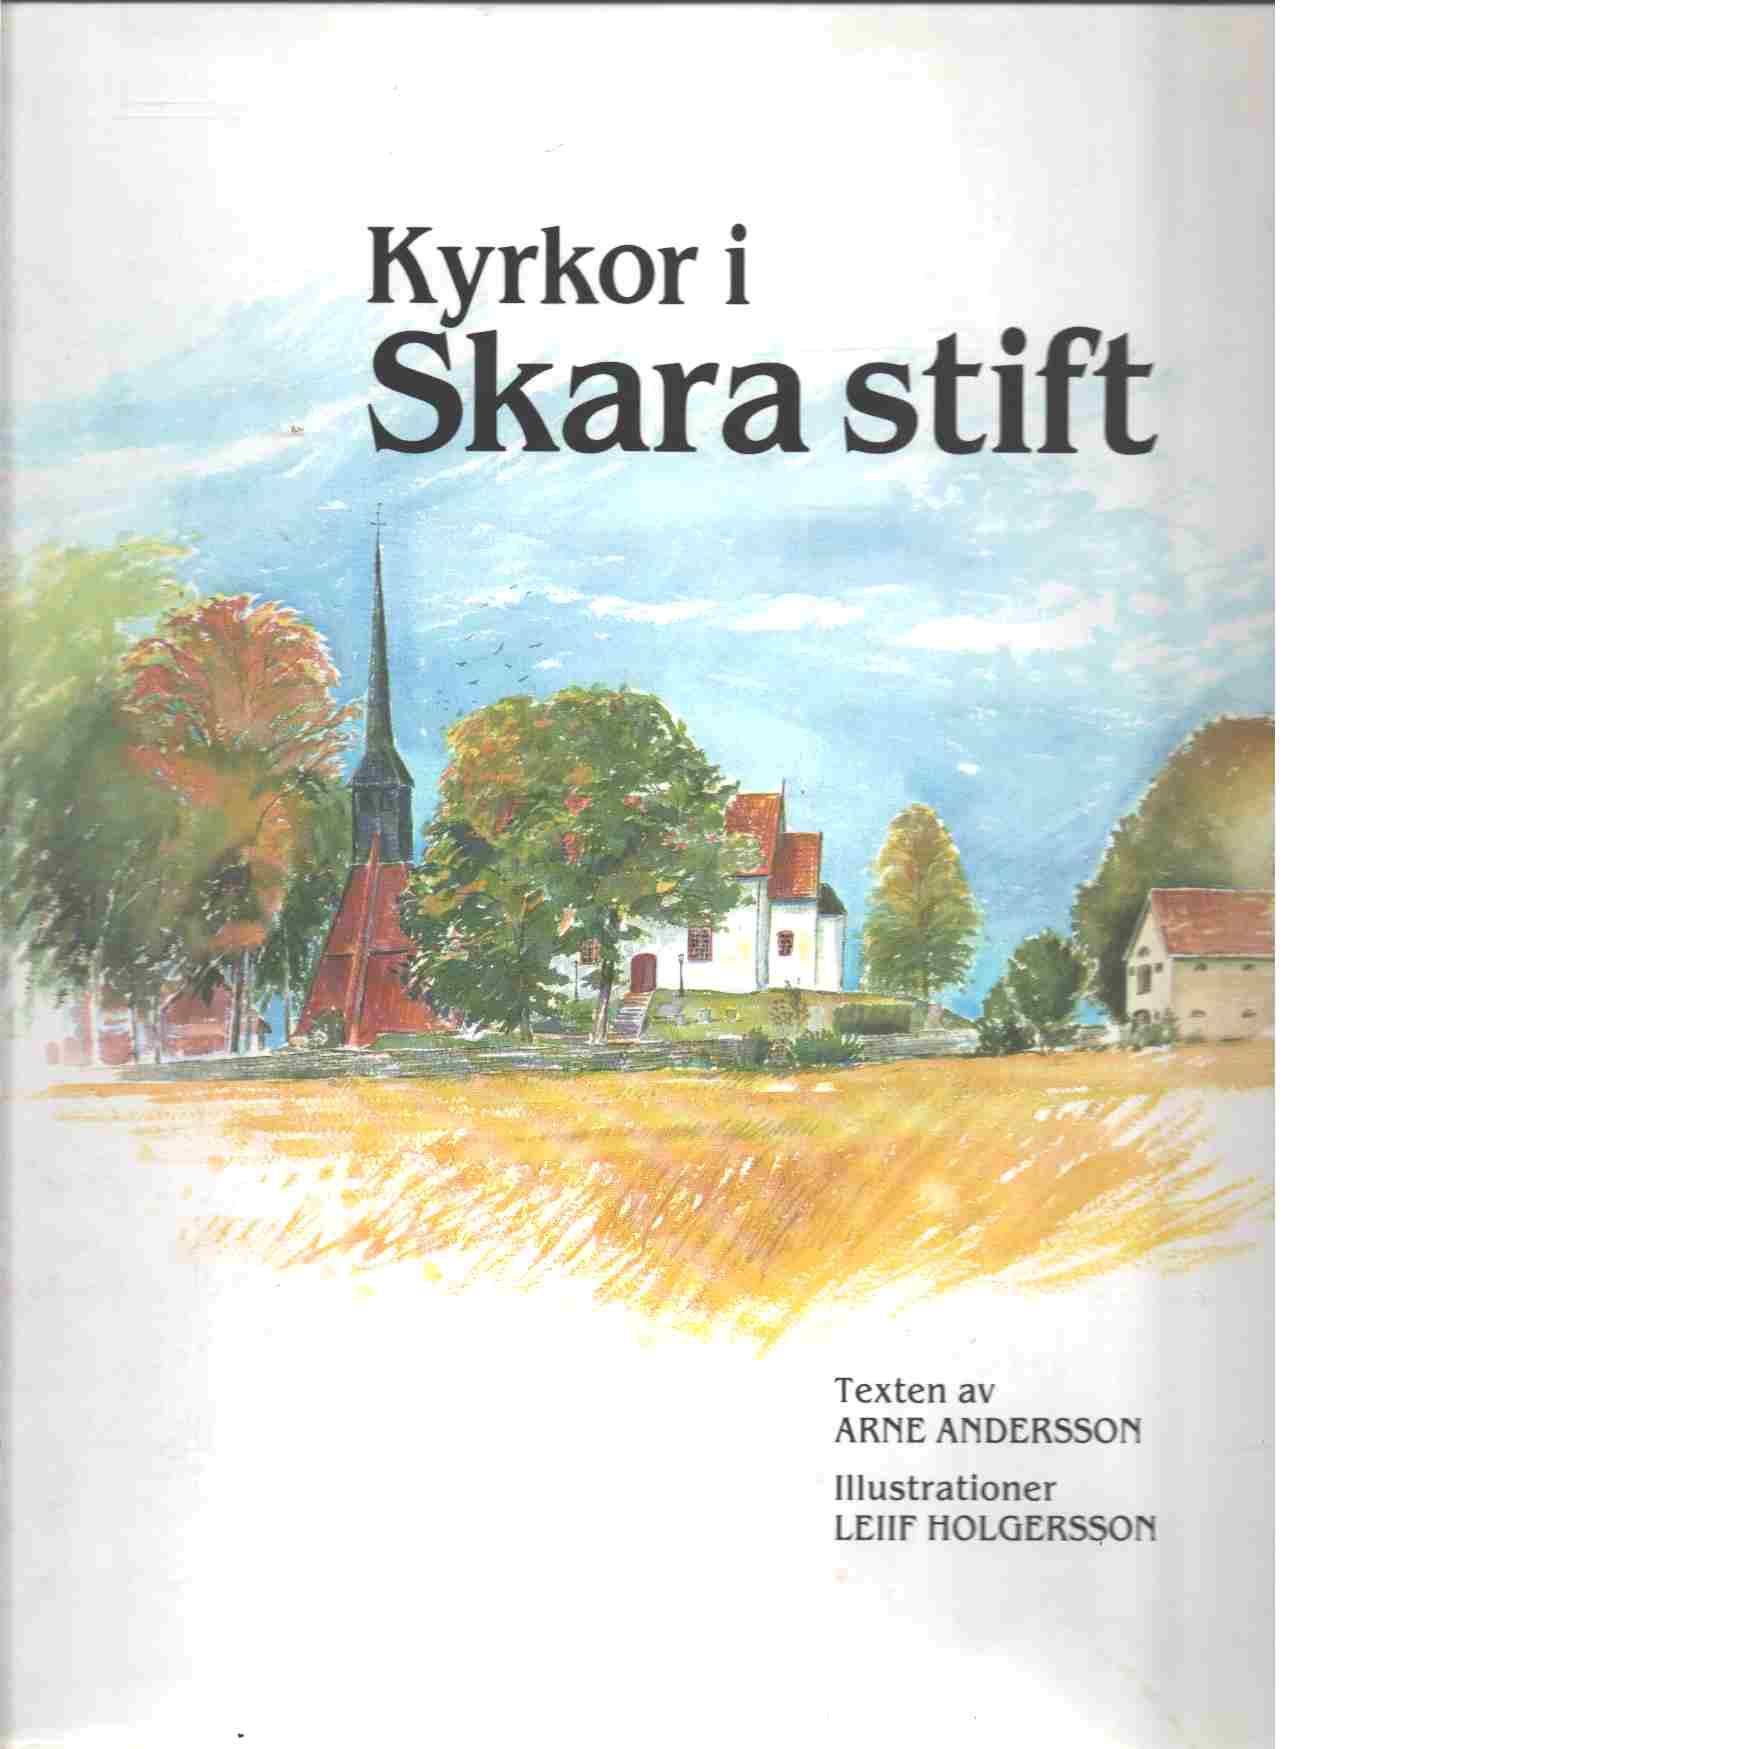 Kyrkor i Skara stift. [1] - Andersson, Arne